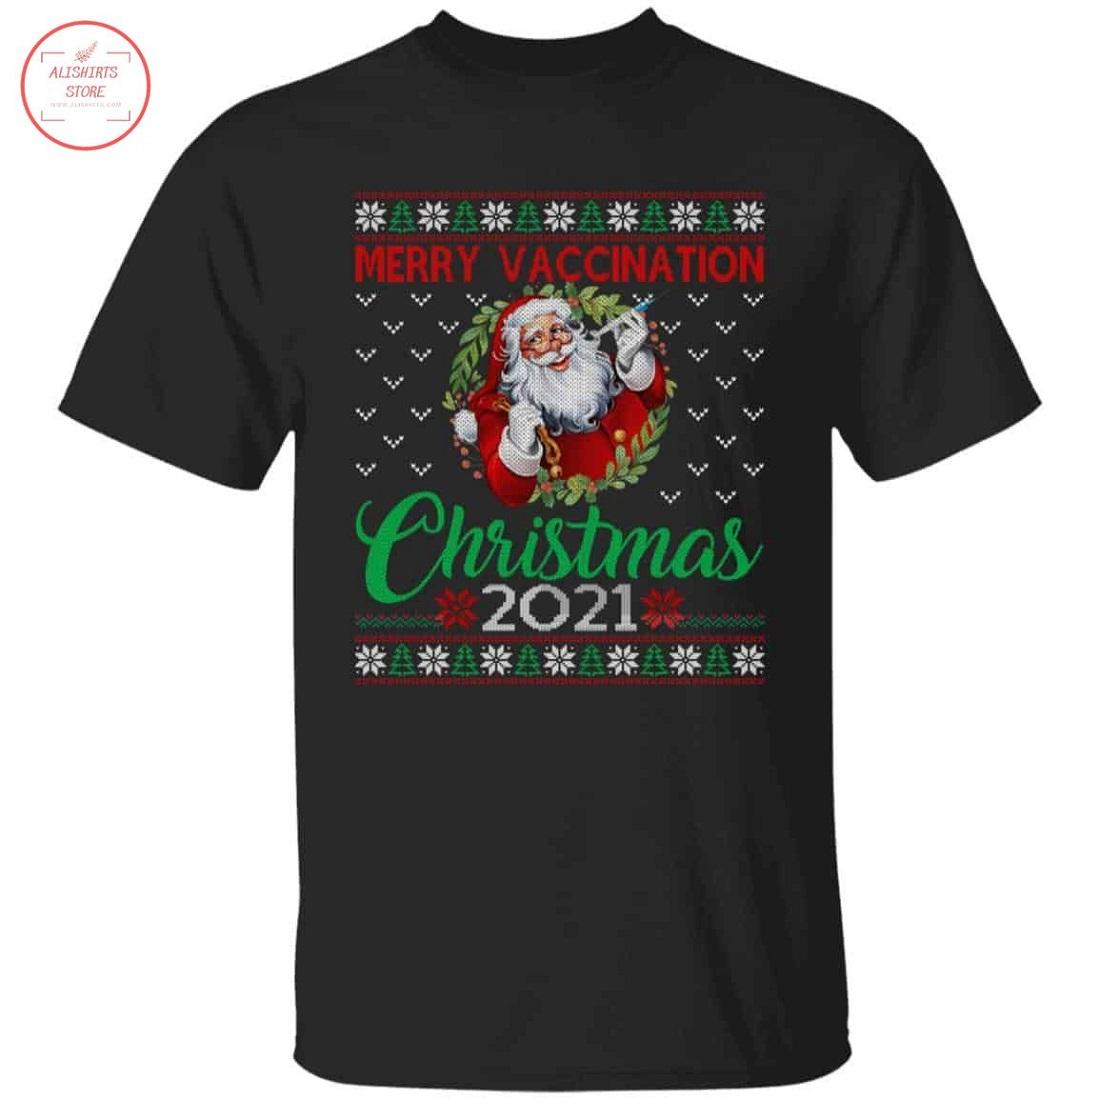 Merry Vaccination Christmas 2021 Santa Ugly Shirt